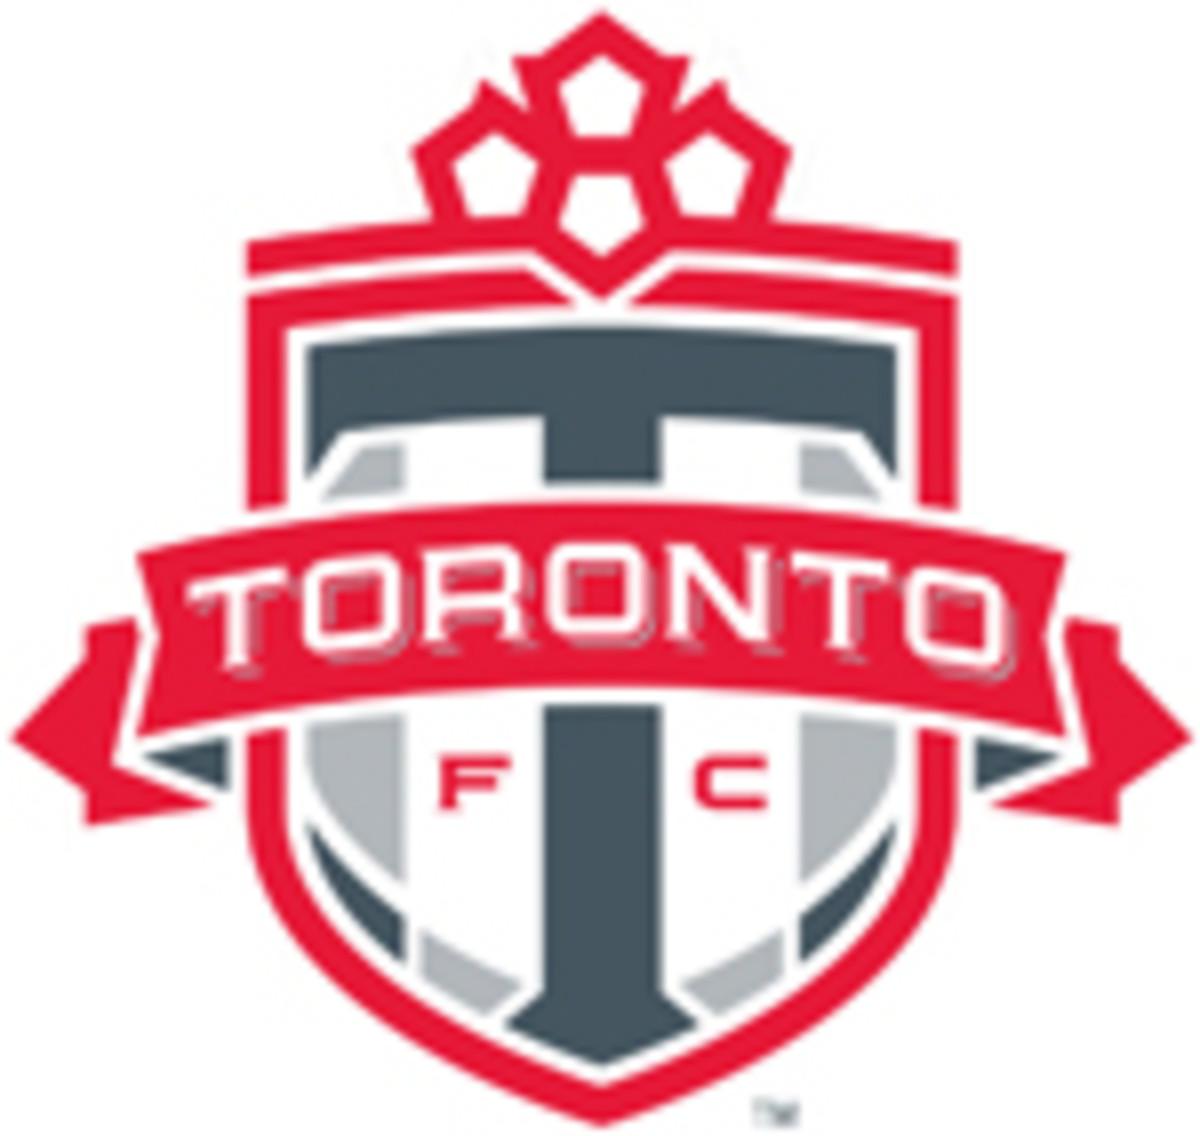 toronto-fc-logo